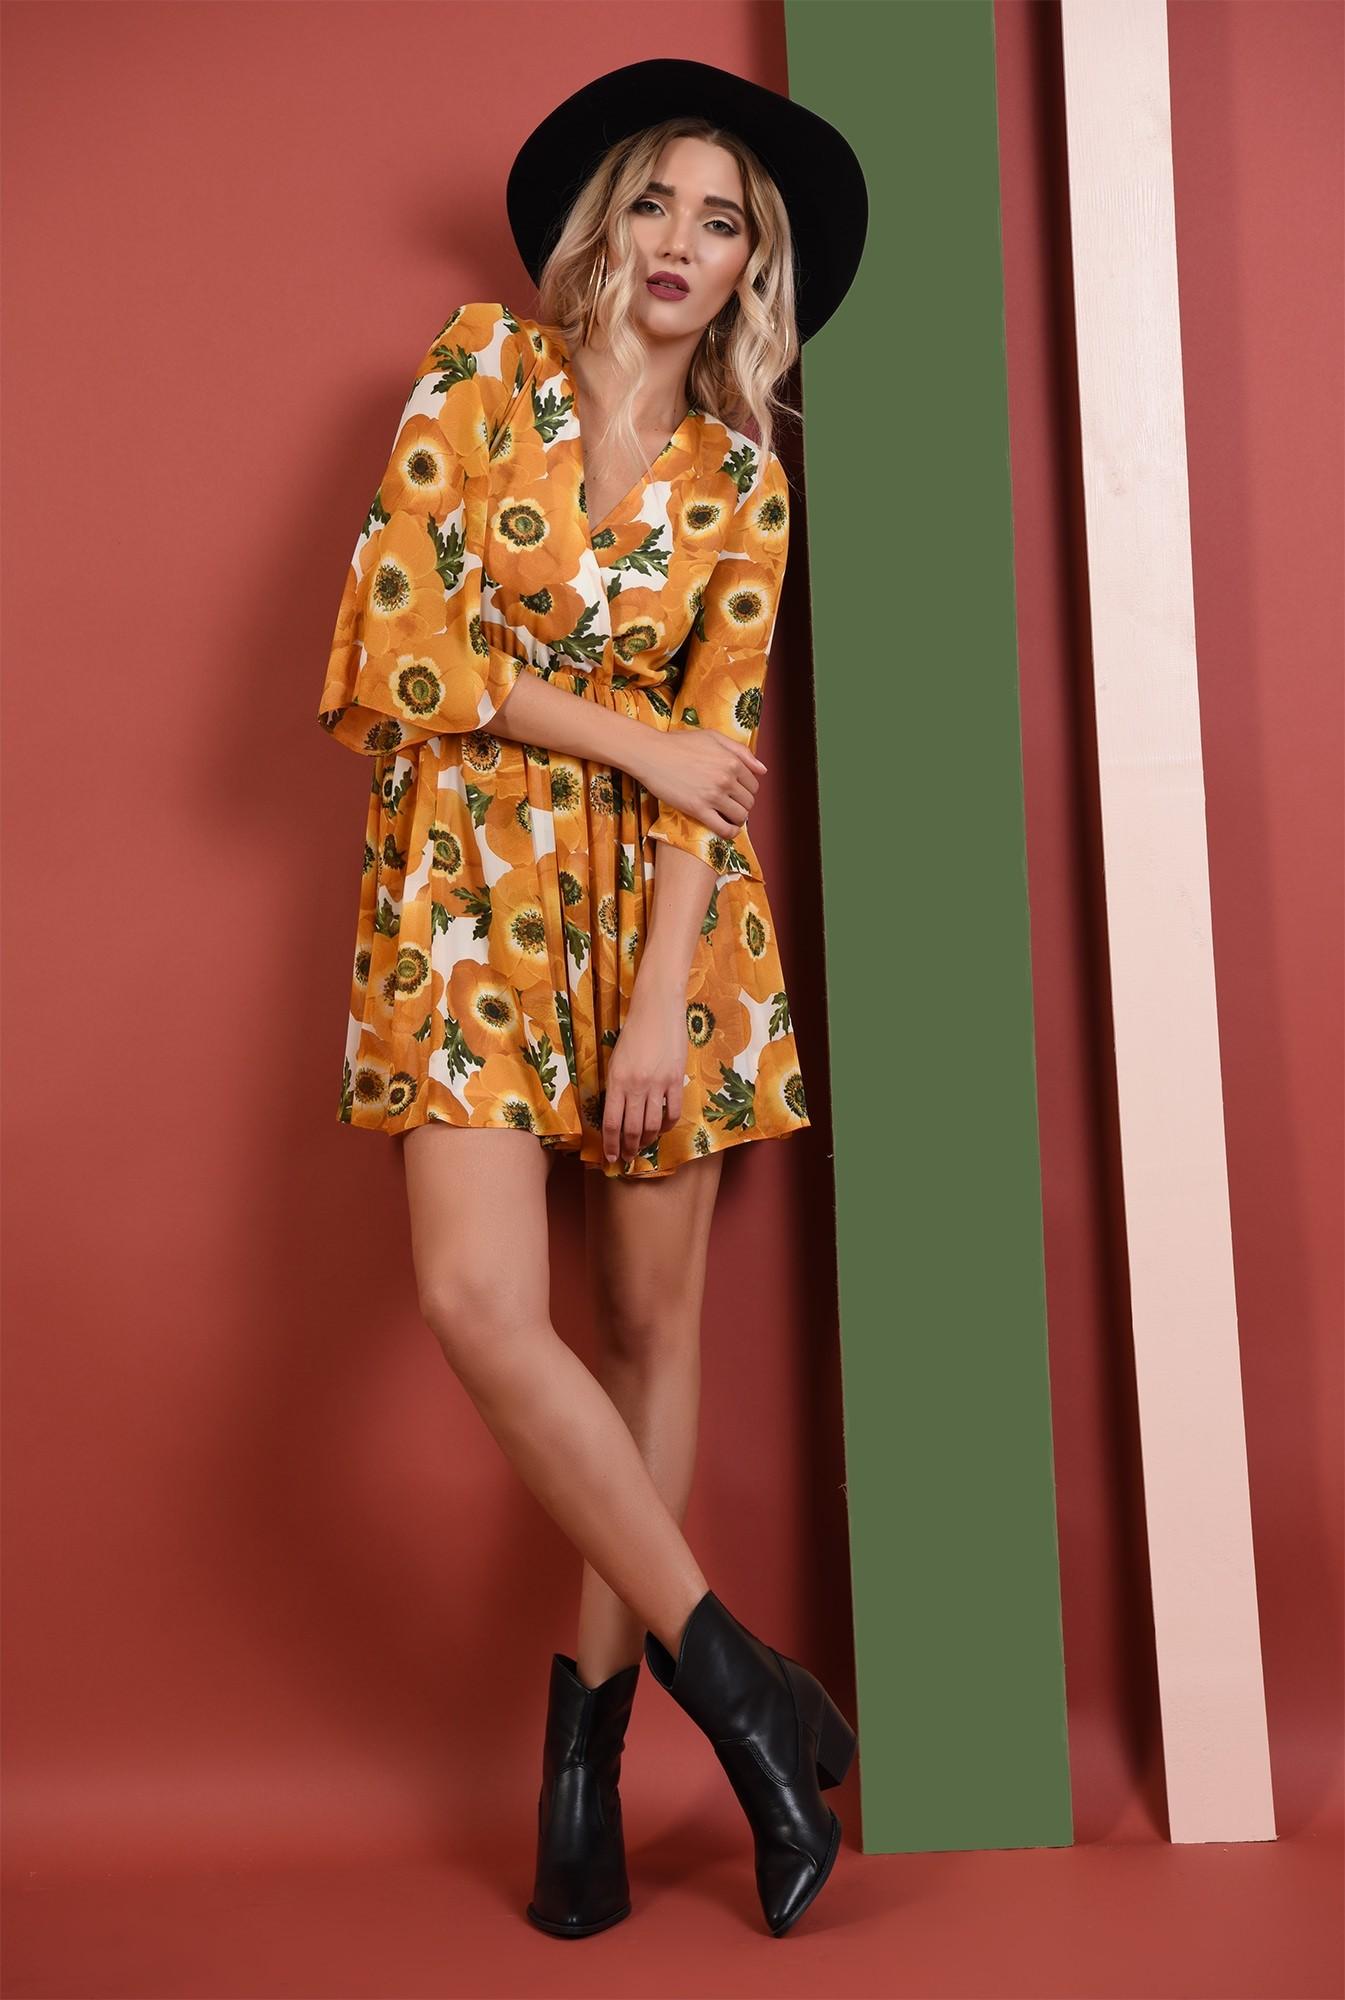 360 - rochie imprimata, casual, clos, talie pe elastic, motive florale